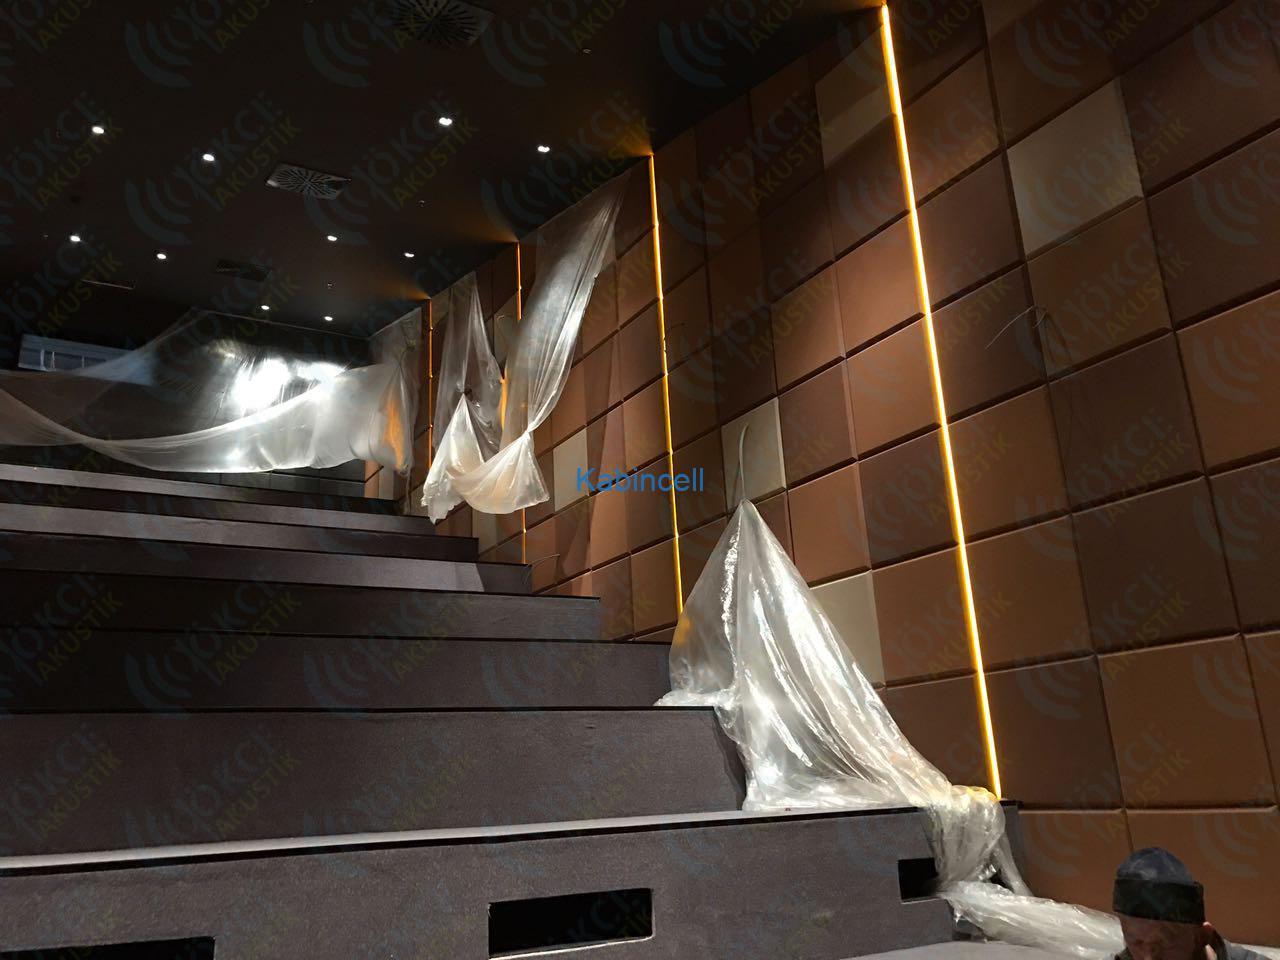 sinema-salonu-akustik-panel-kaplama-kumas-kapli-panel-parmephon02